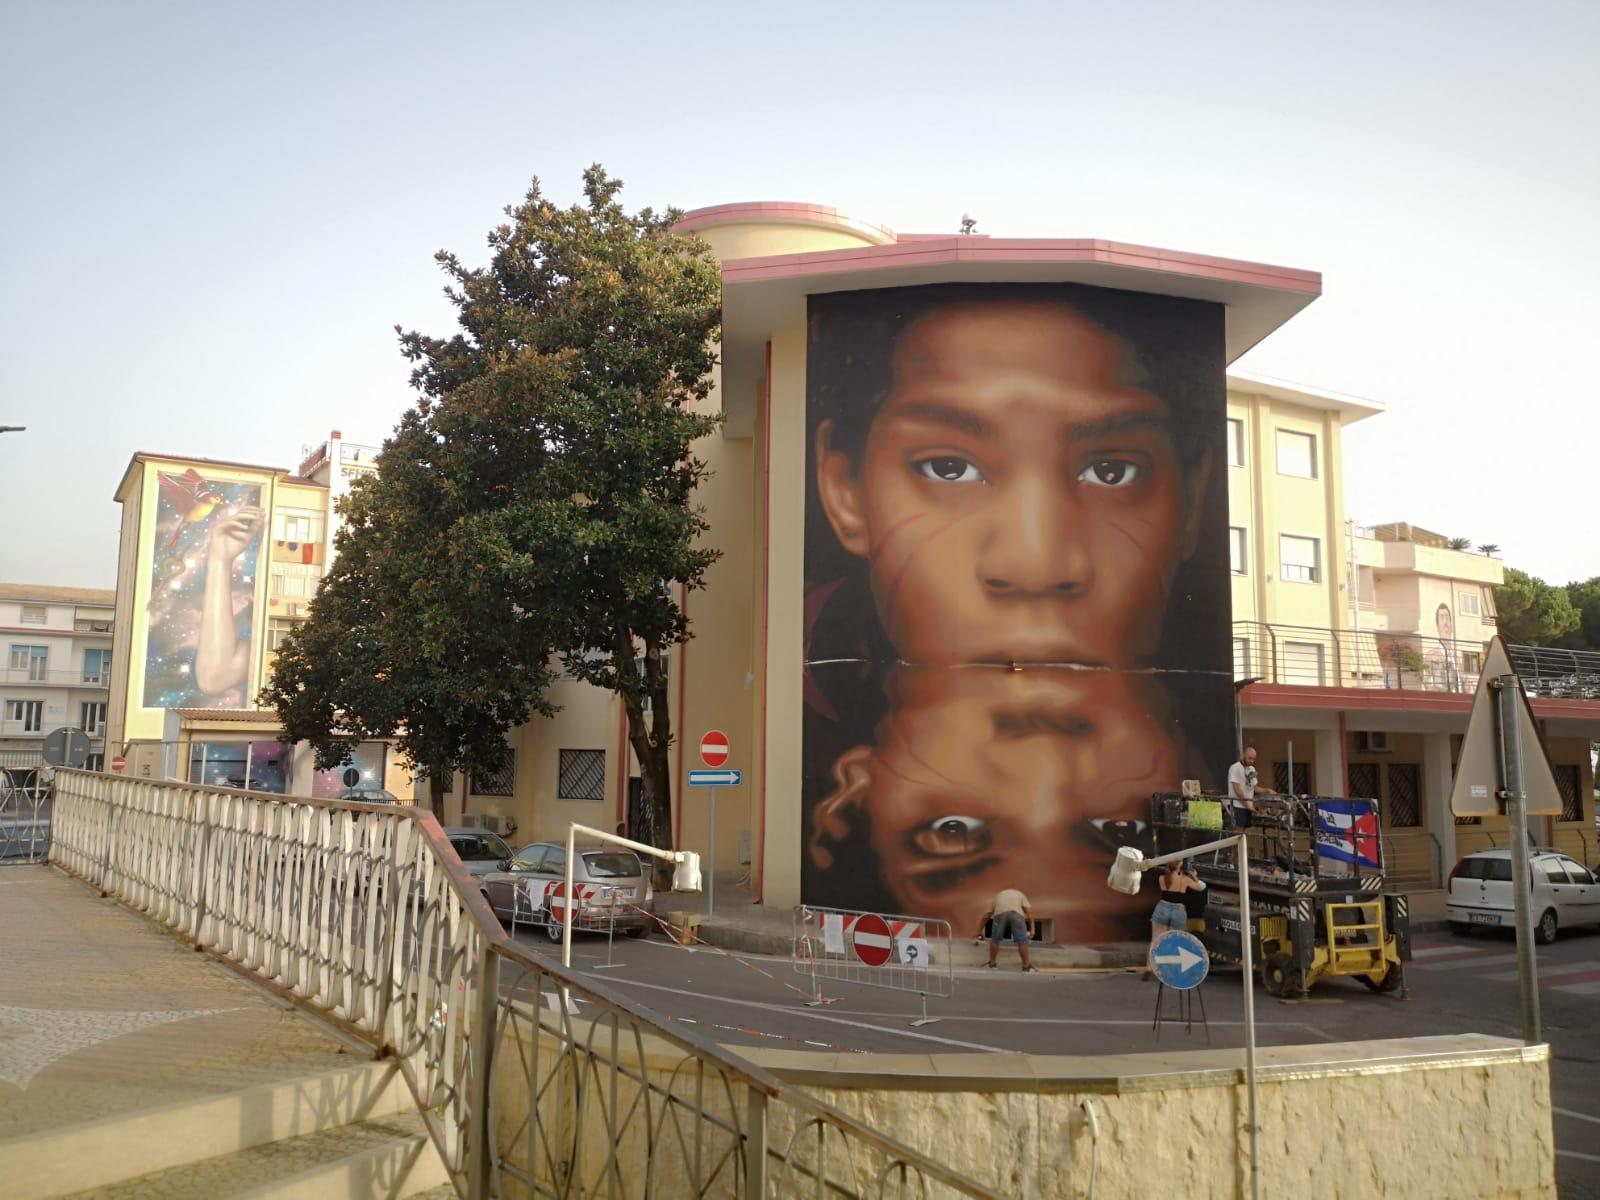 La street art invade la Calabria con Diamante Murales 40